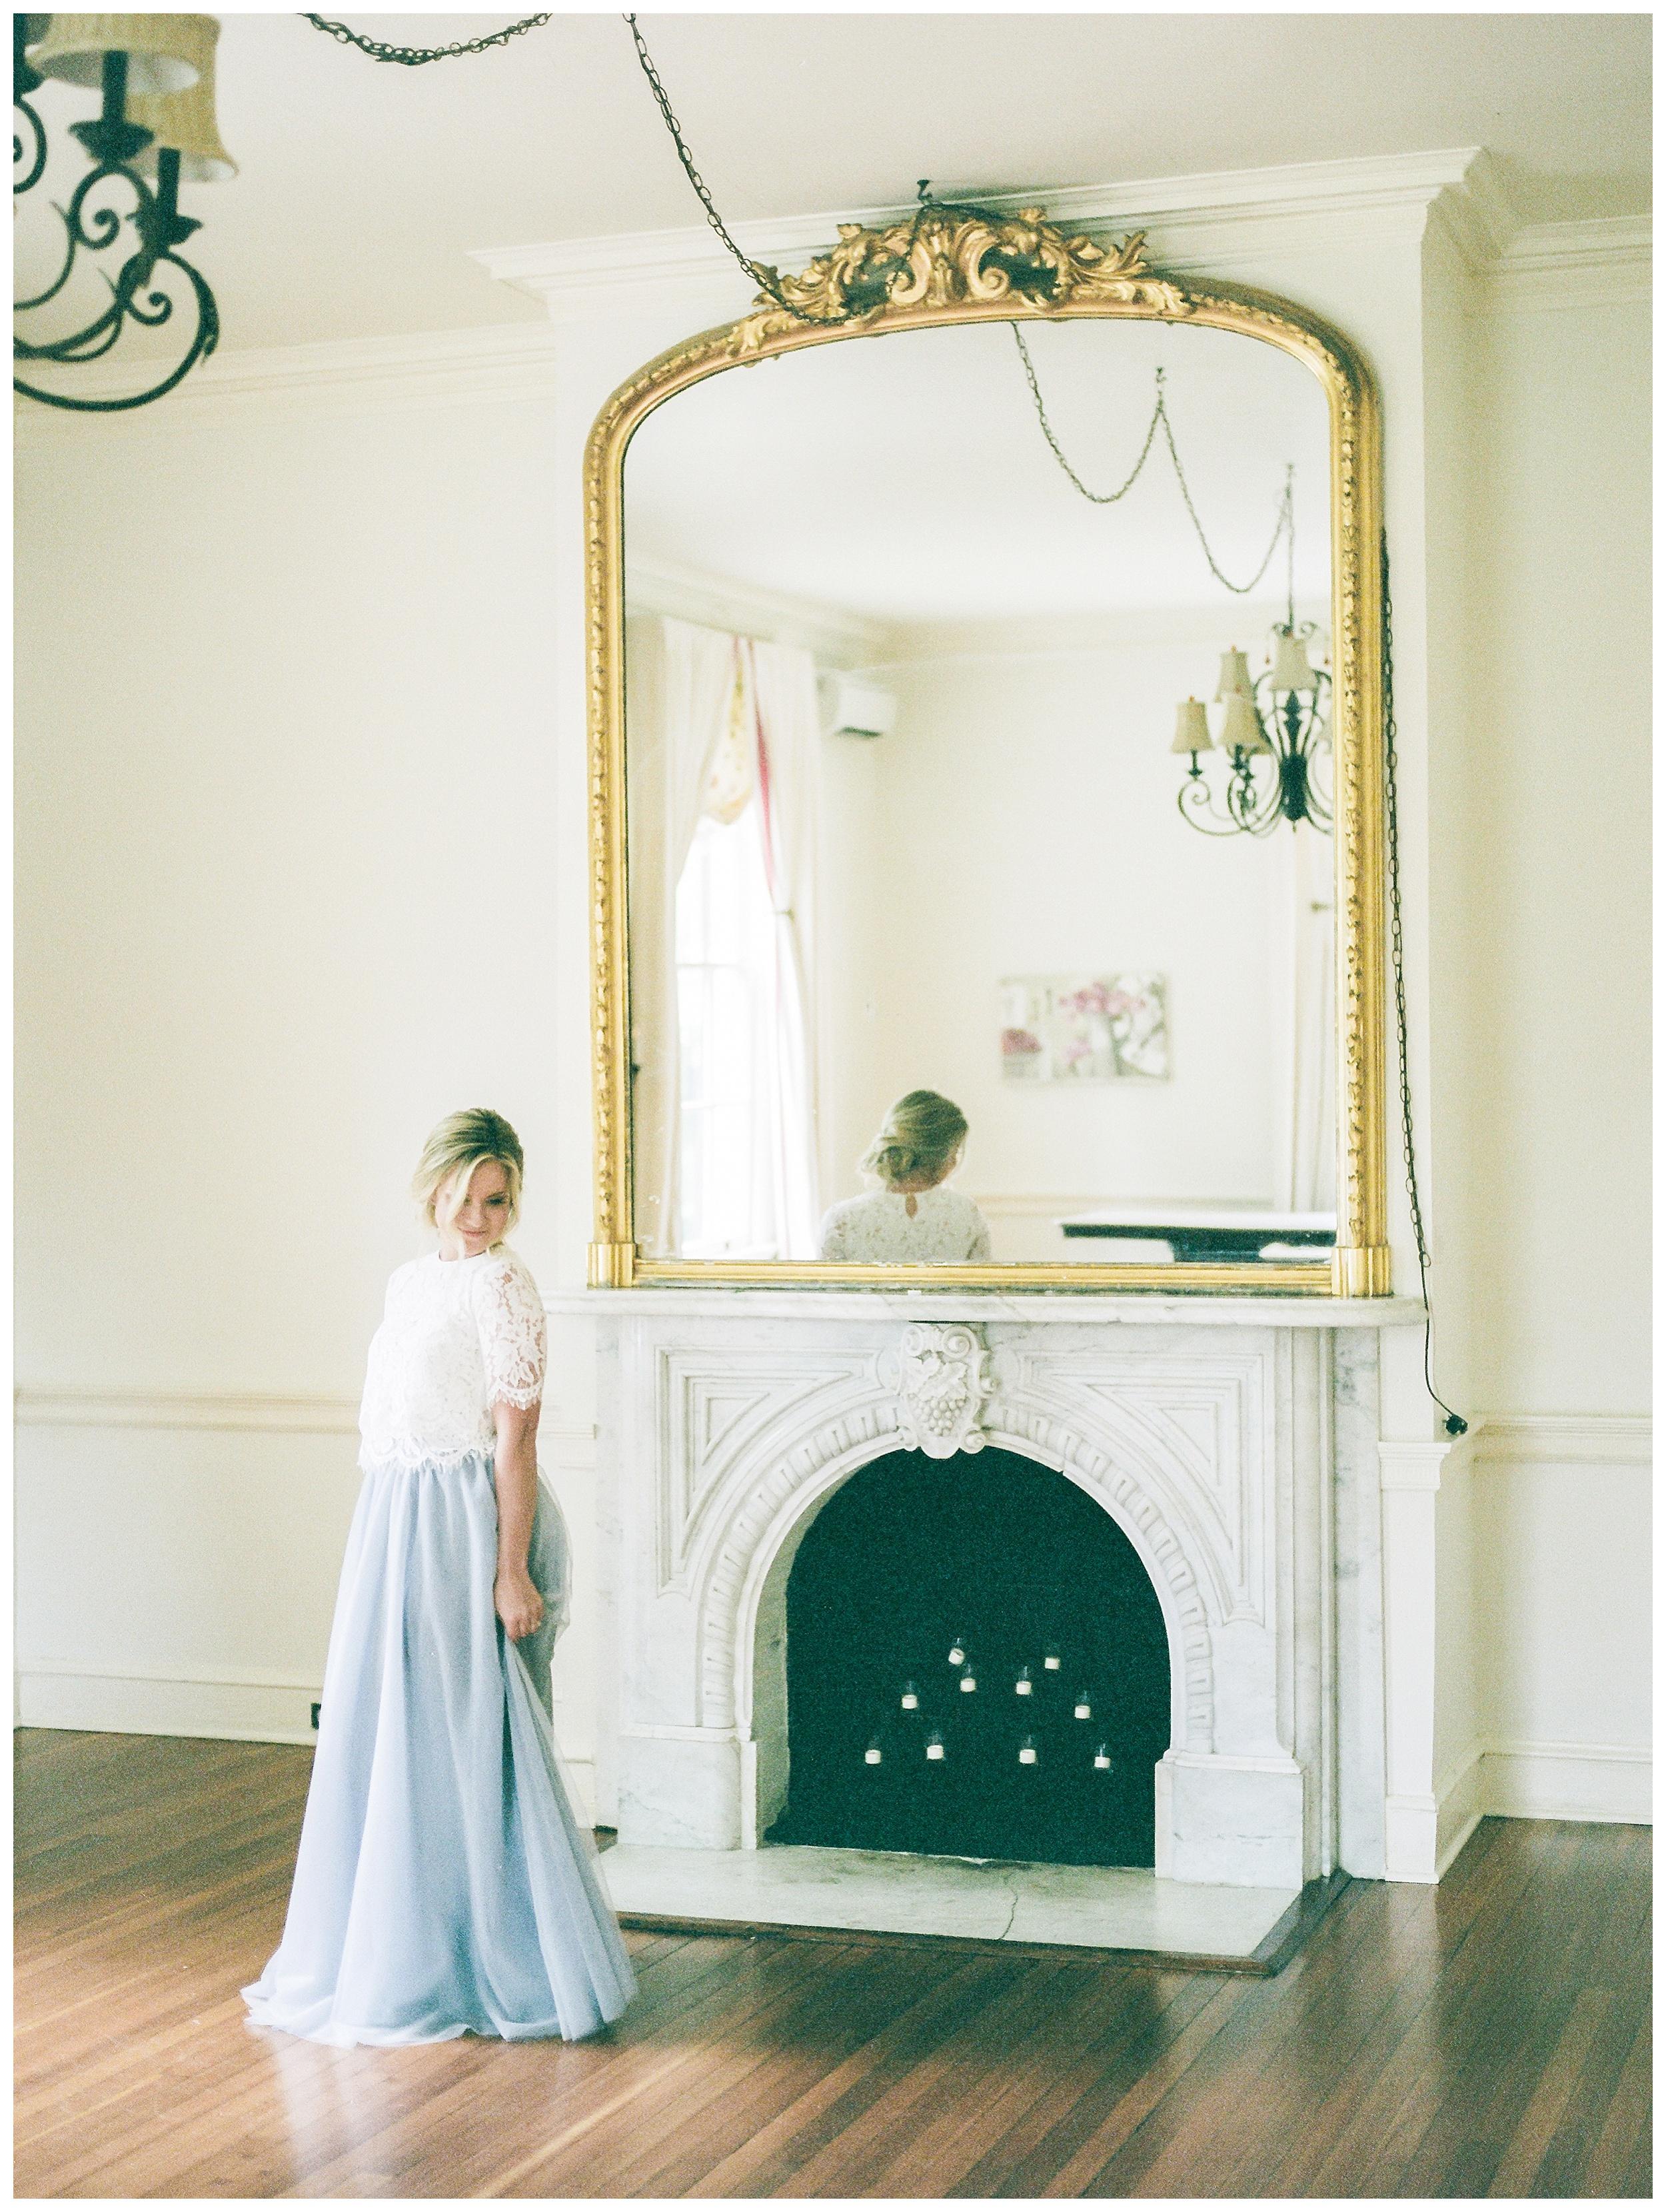 Rust Manor Wedding   Virginia Wedding Photographer Kir Tuben_0003.jpg